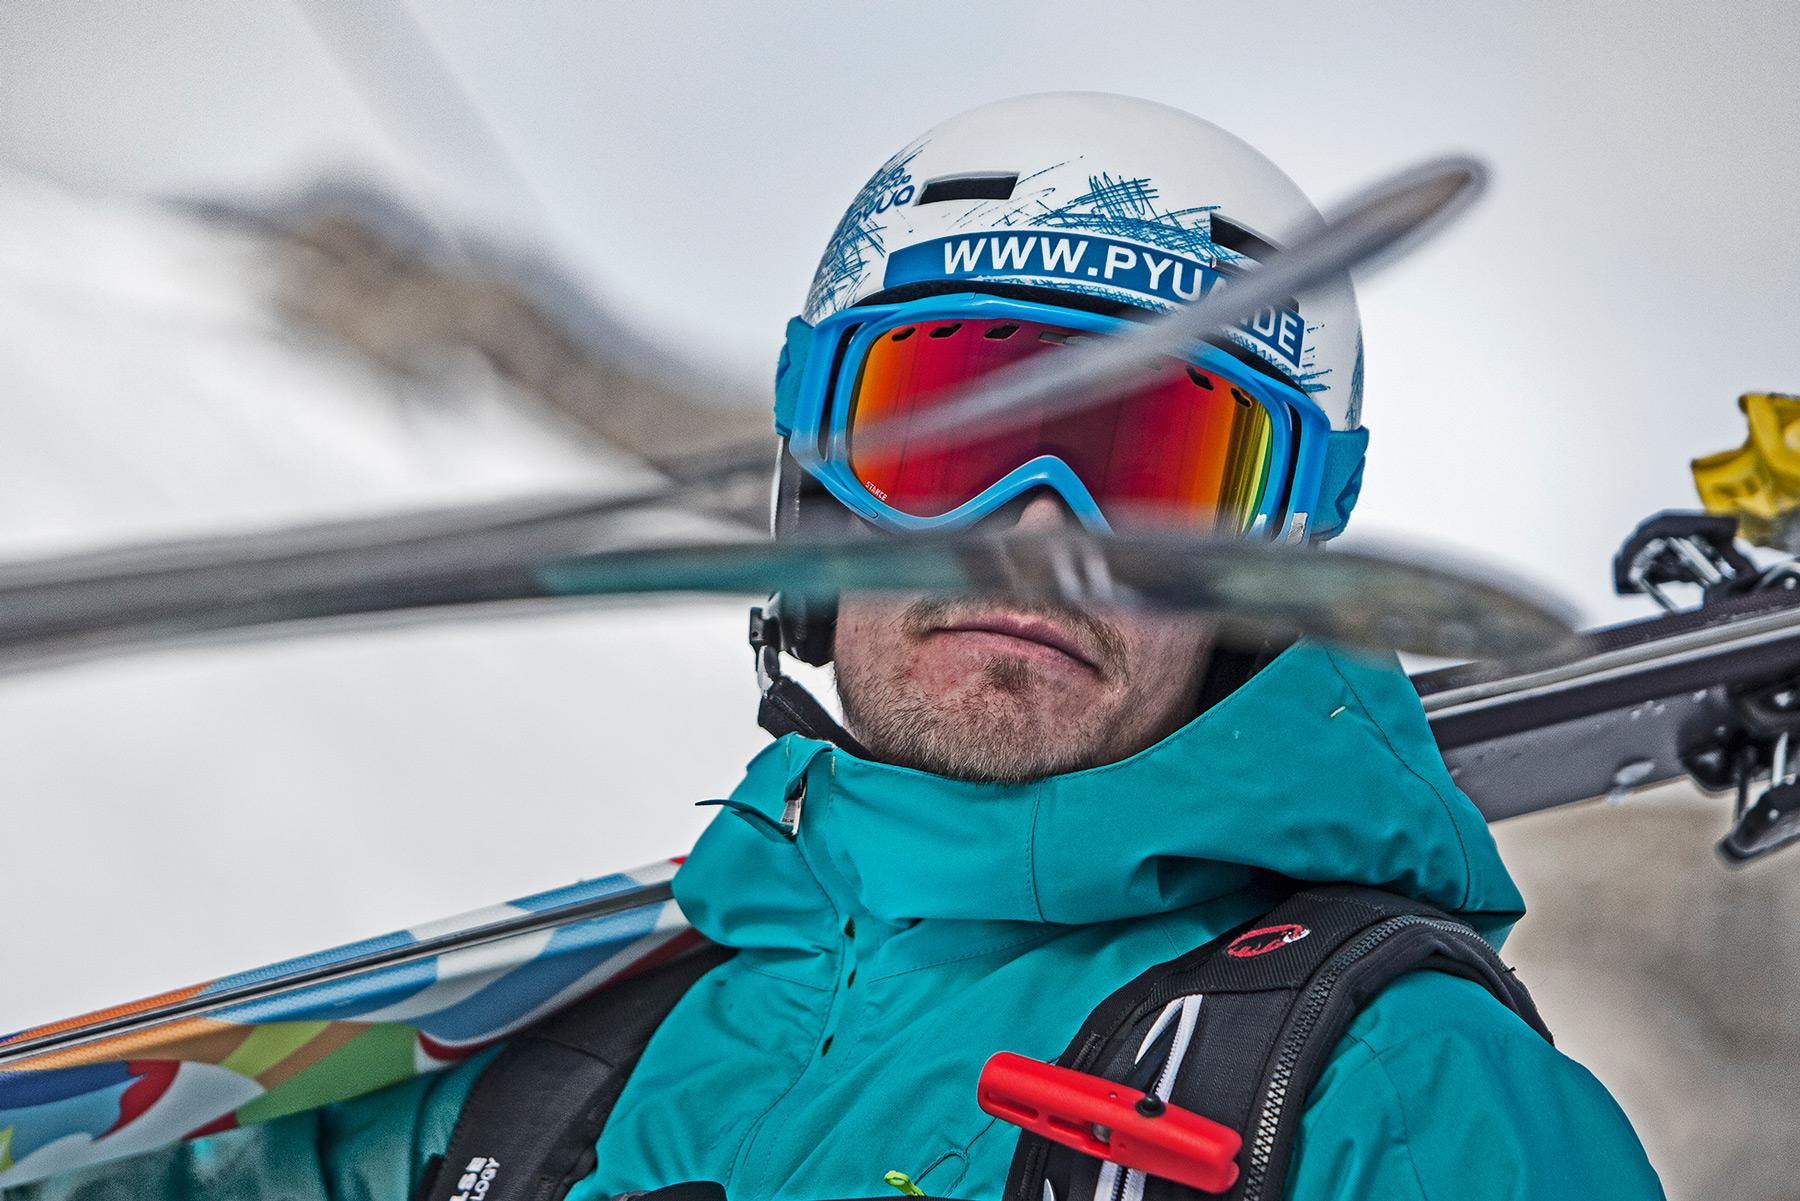 13-Pyua-Dachstein-Ski-Action-Christoph-Gramann